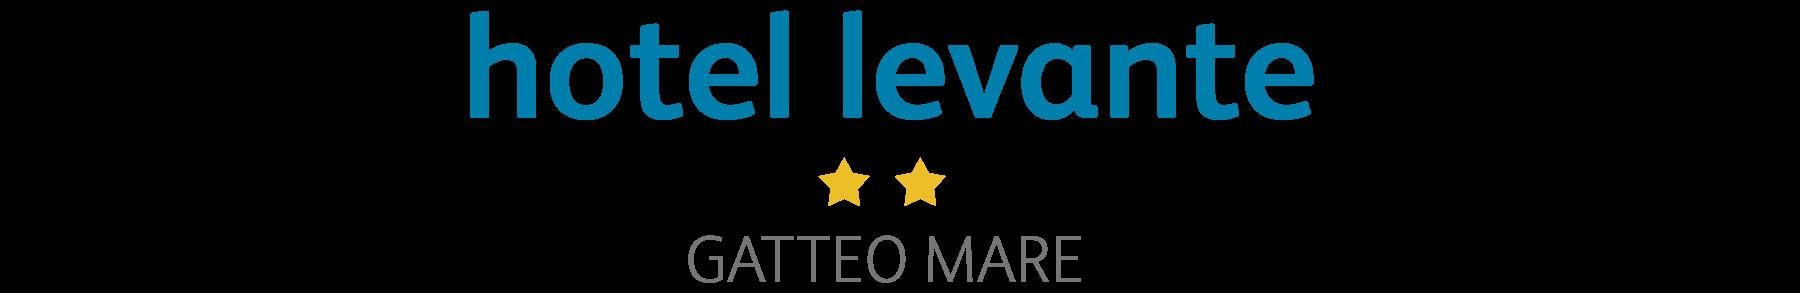 Hotel Levante Gatteo